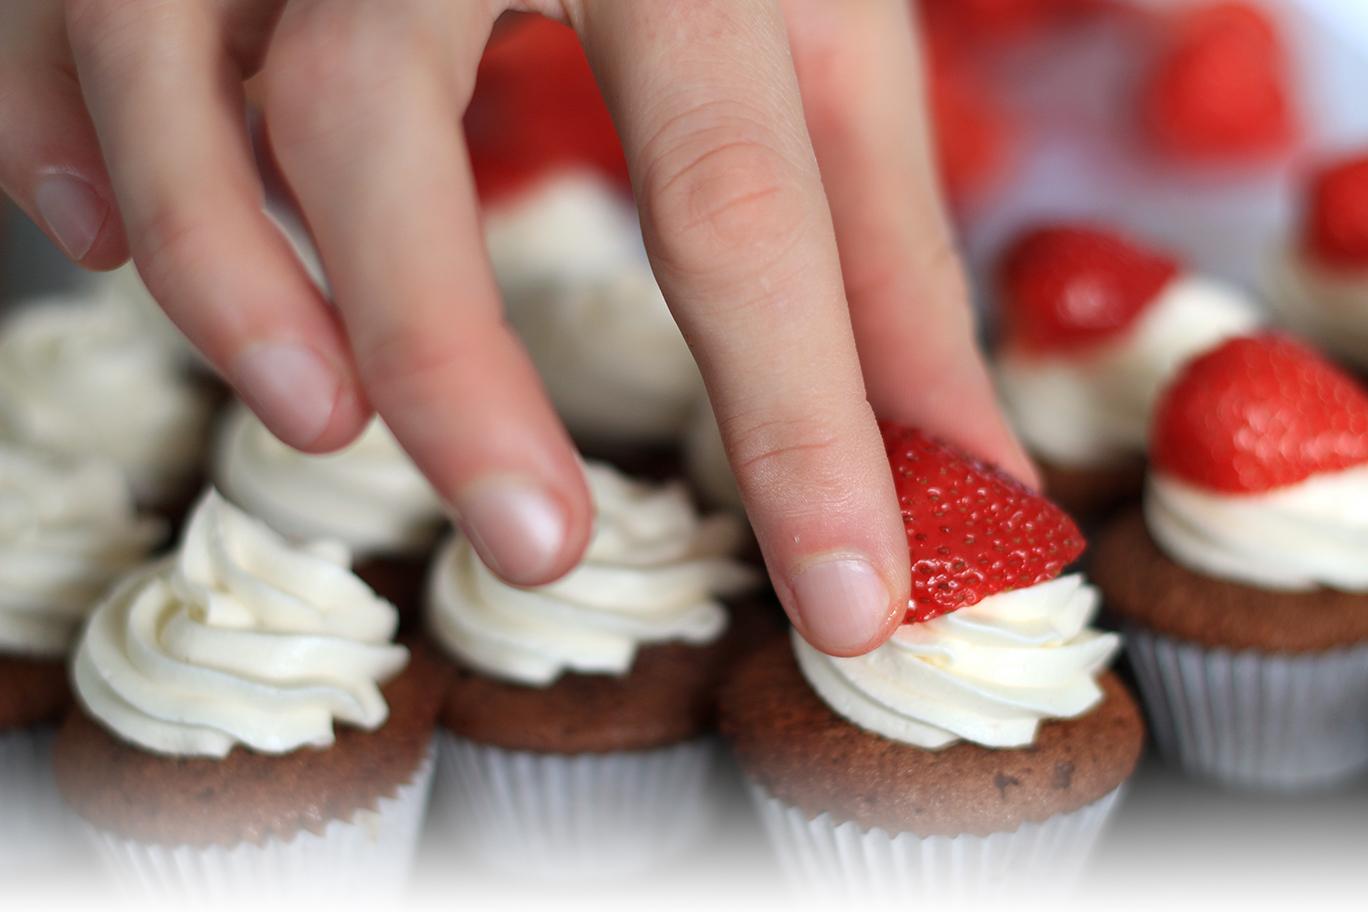 1 cupcake standard correspond environ à 3 mini cupcakes